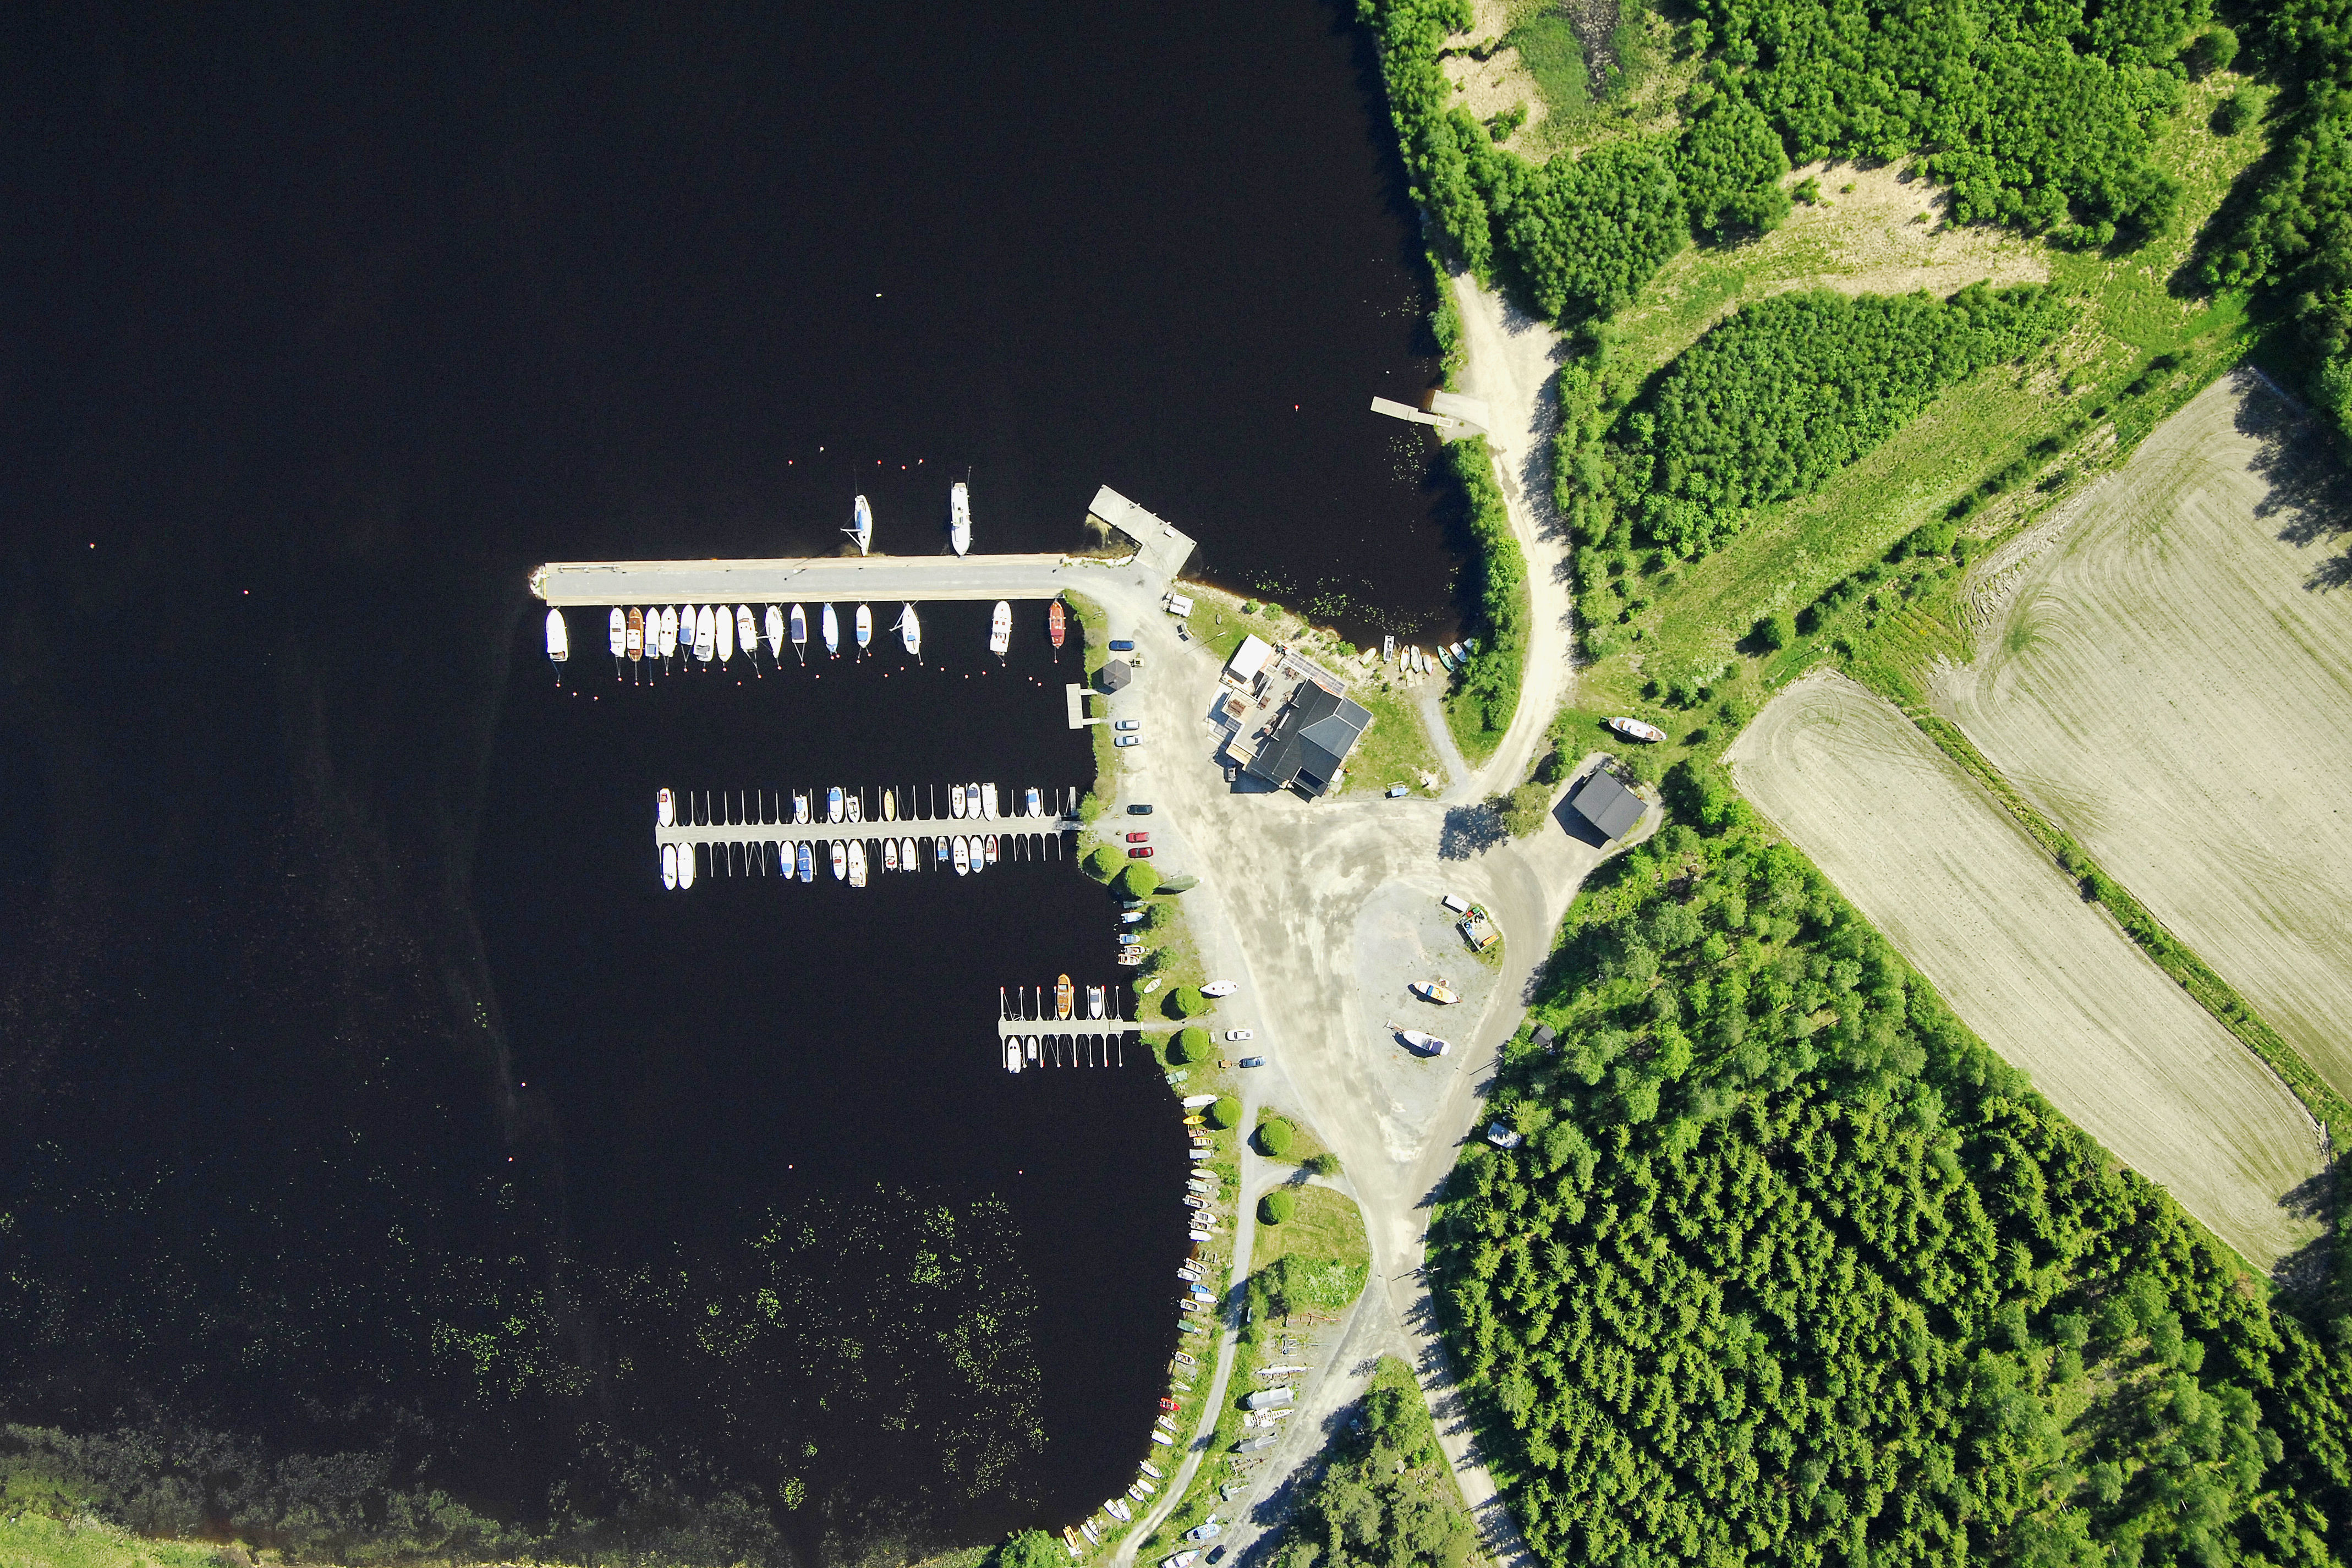 Jamsa Hulkkionlahti Marina in Kaipola Finland Marina Reviews